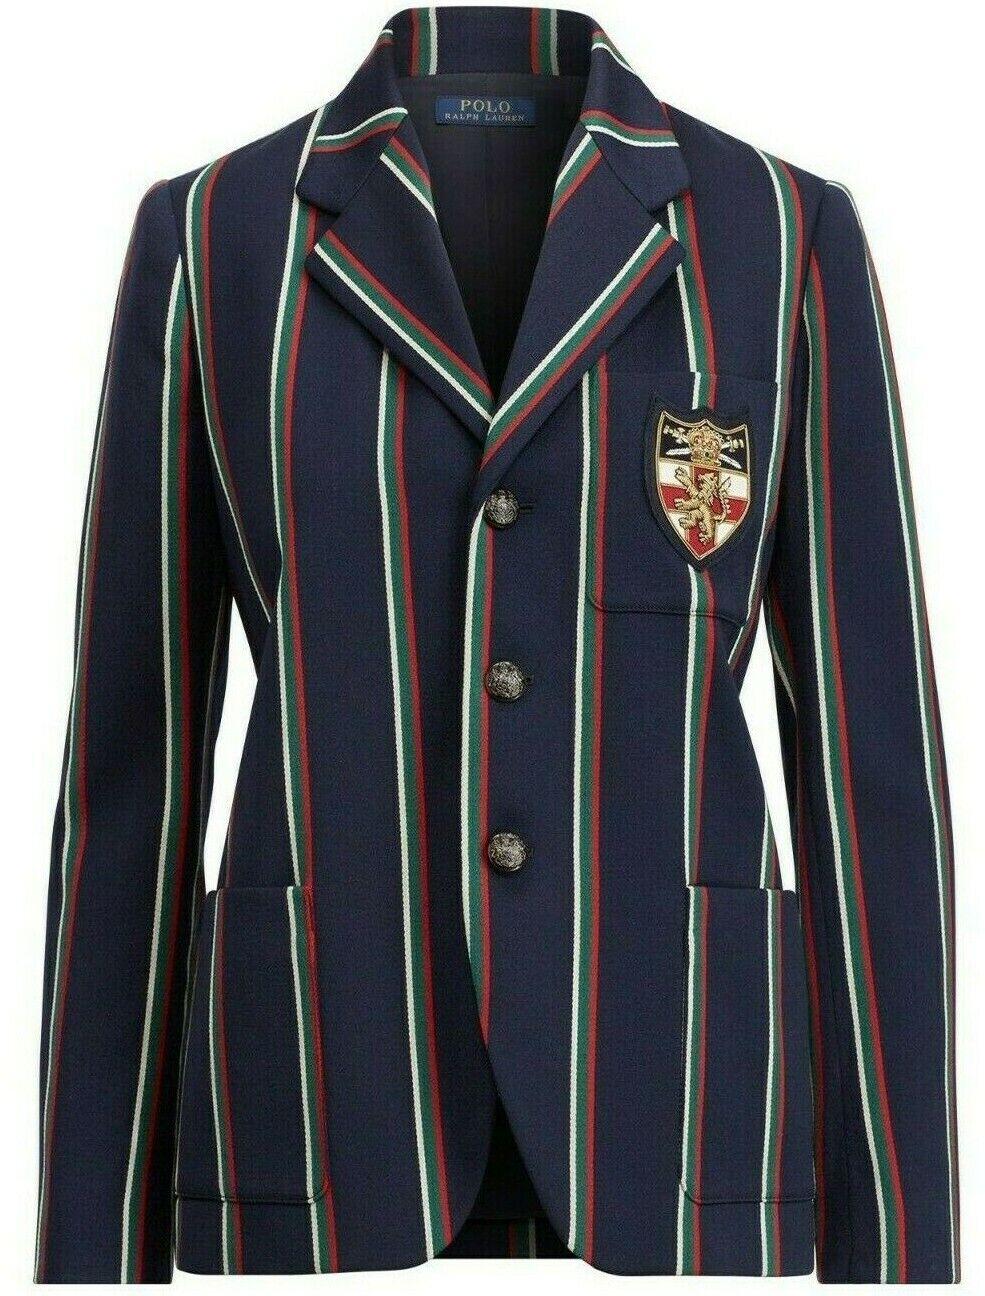 Nuovo Polo Ralph Lauren Blu Navy a Righe Lana Giacca Blazer Rosso verde 6 8 10